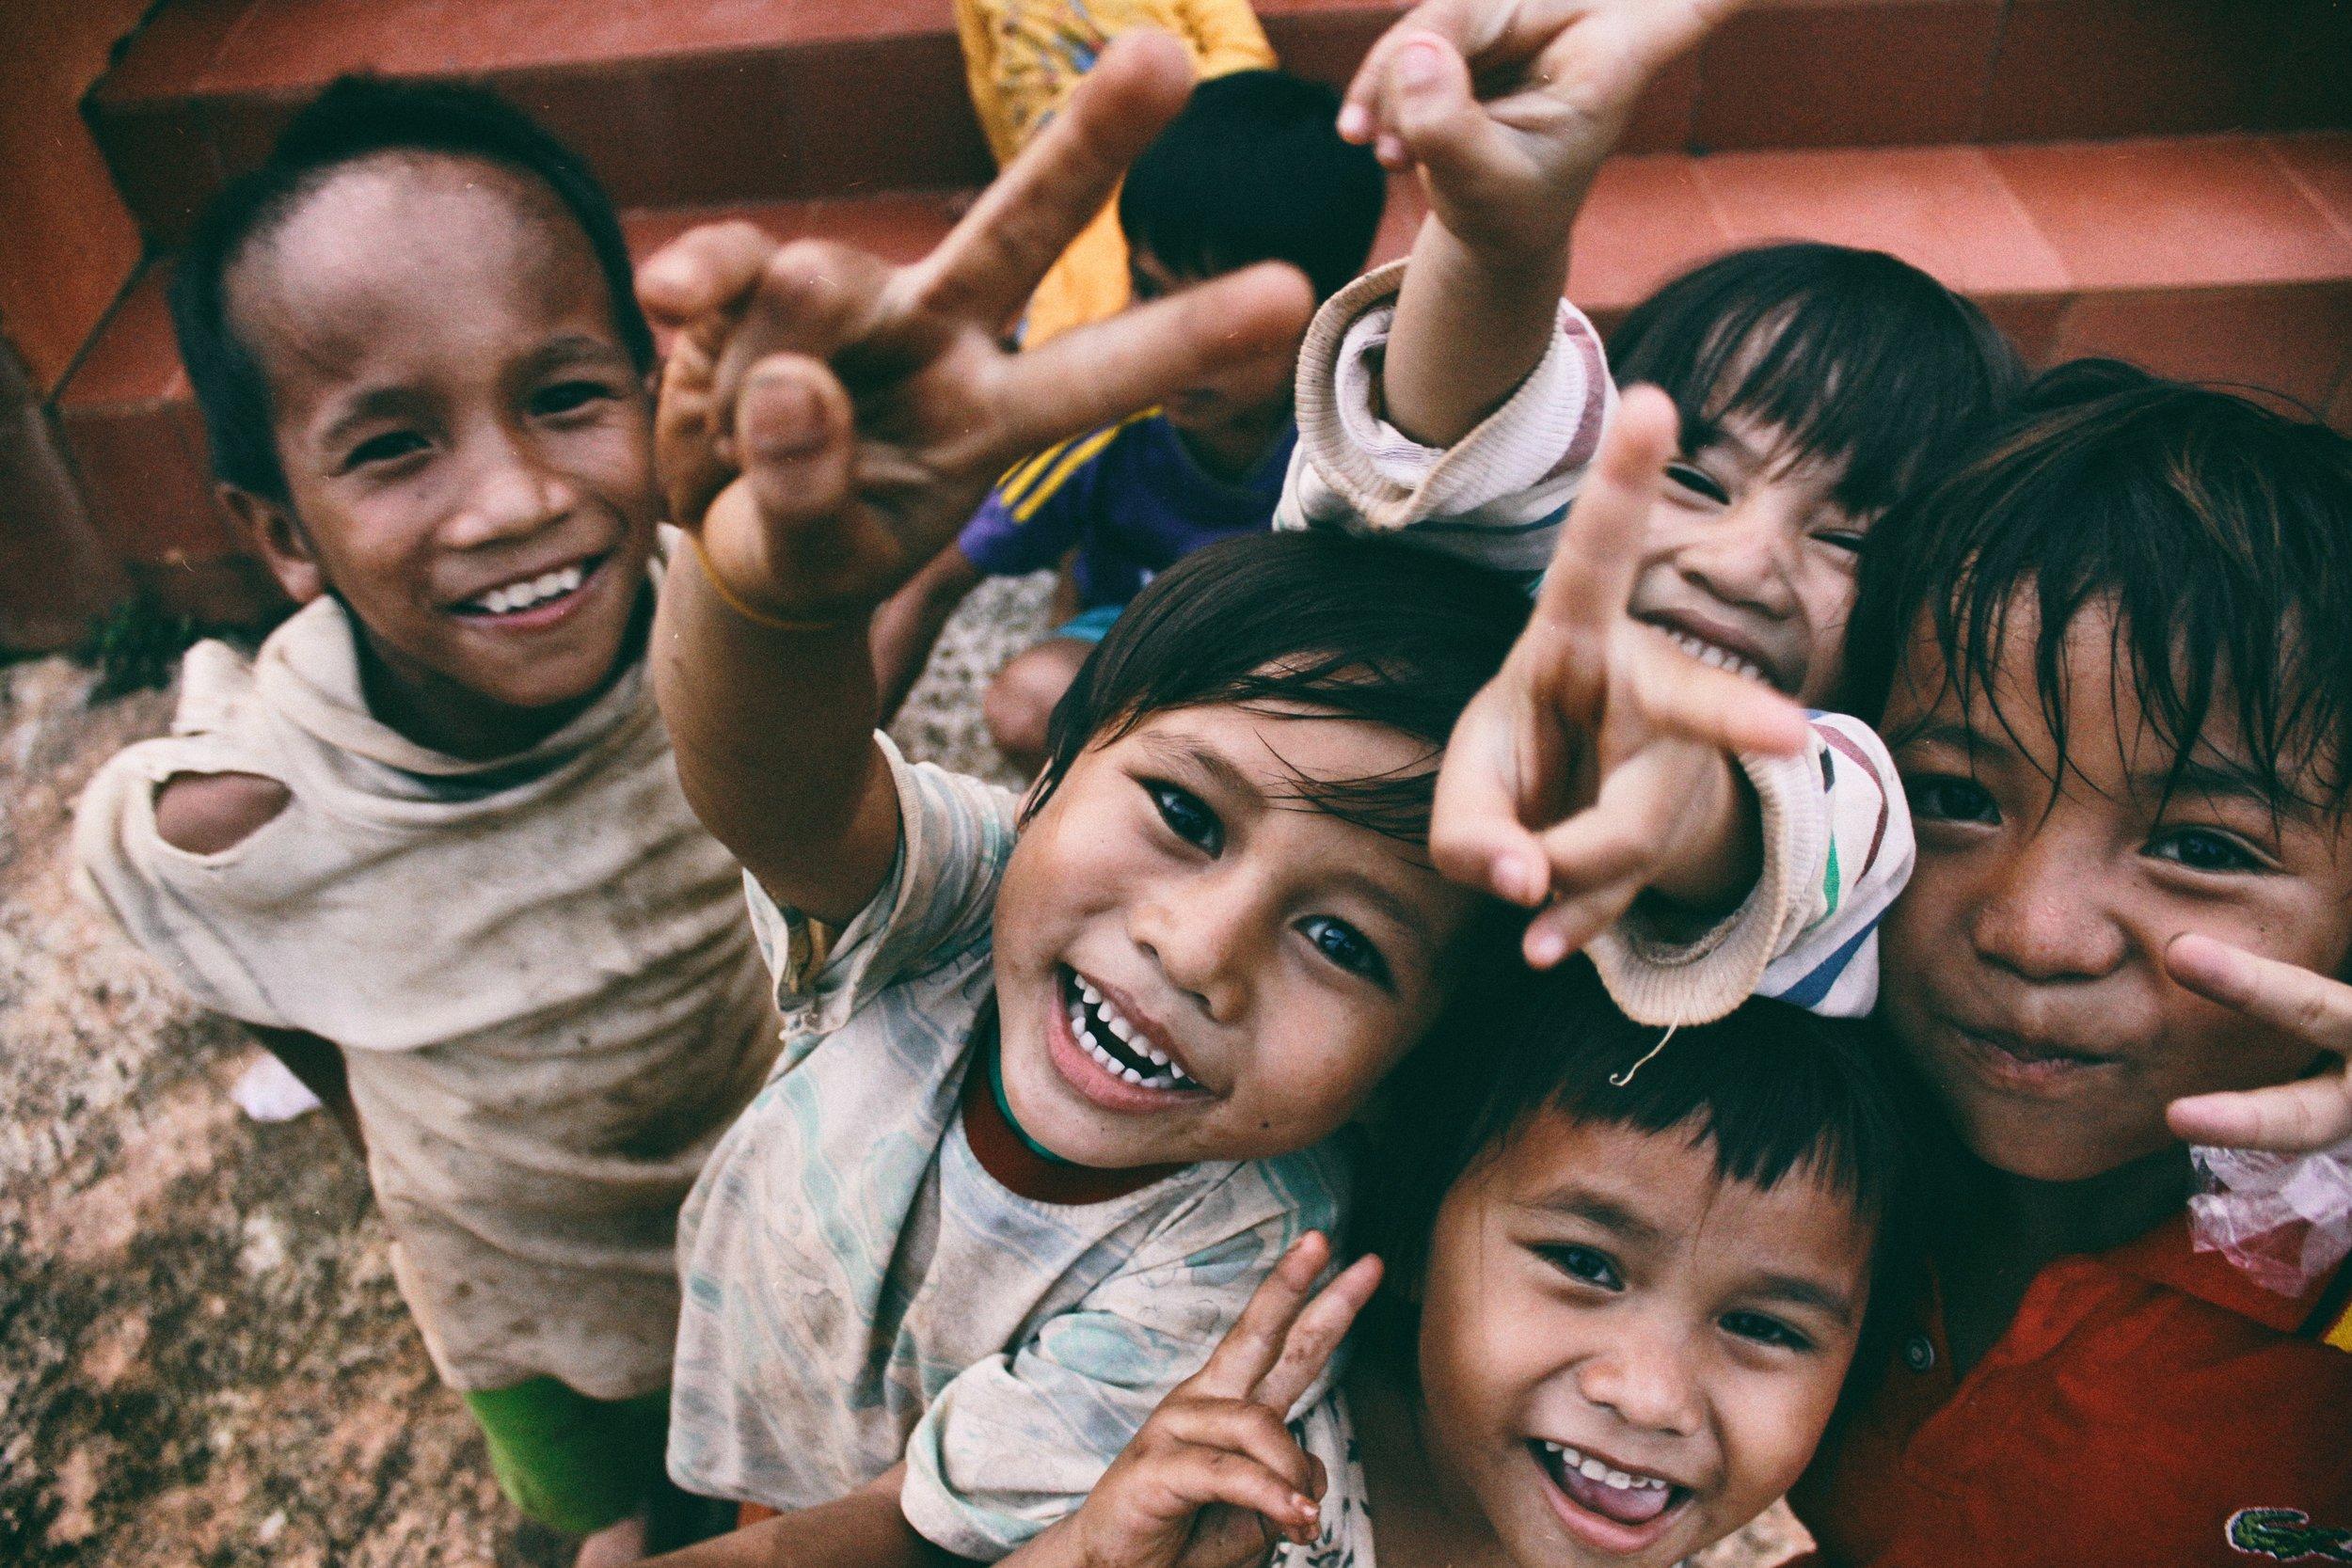 happy poor children larm-rmah-216854-unsplash.jpg